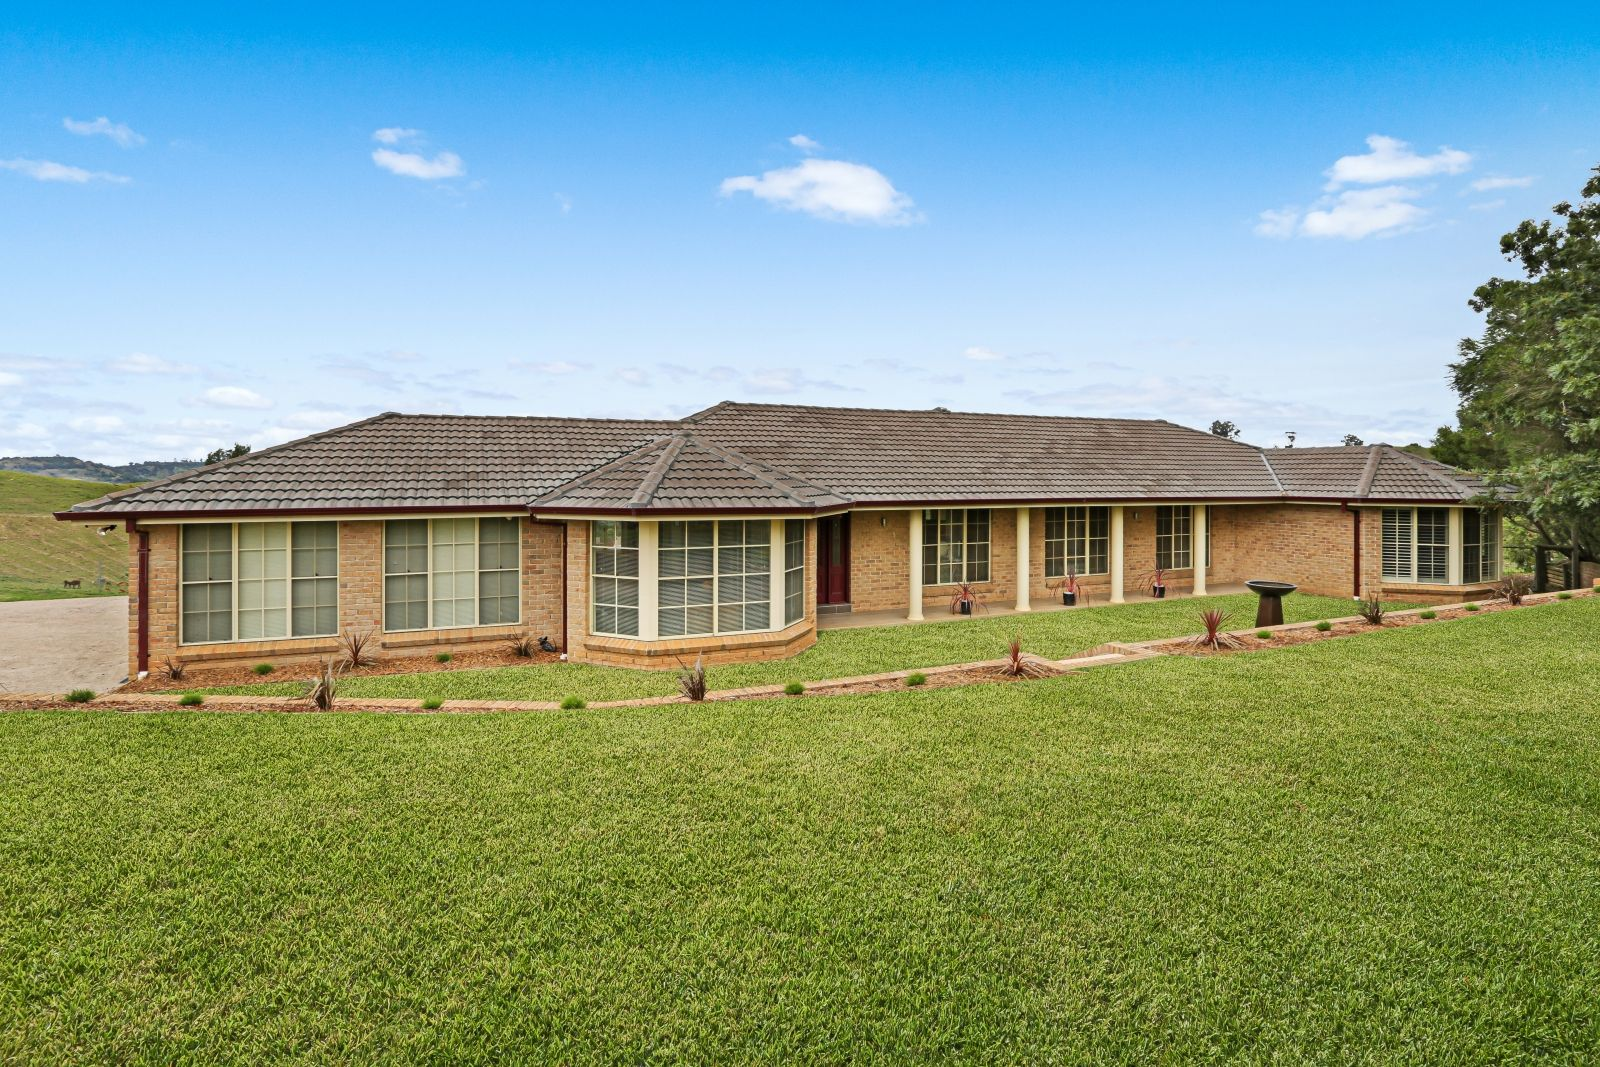 11/150 Abbotsford Road, Picton NSW 2571, Image 1